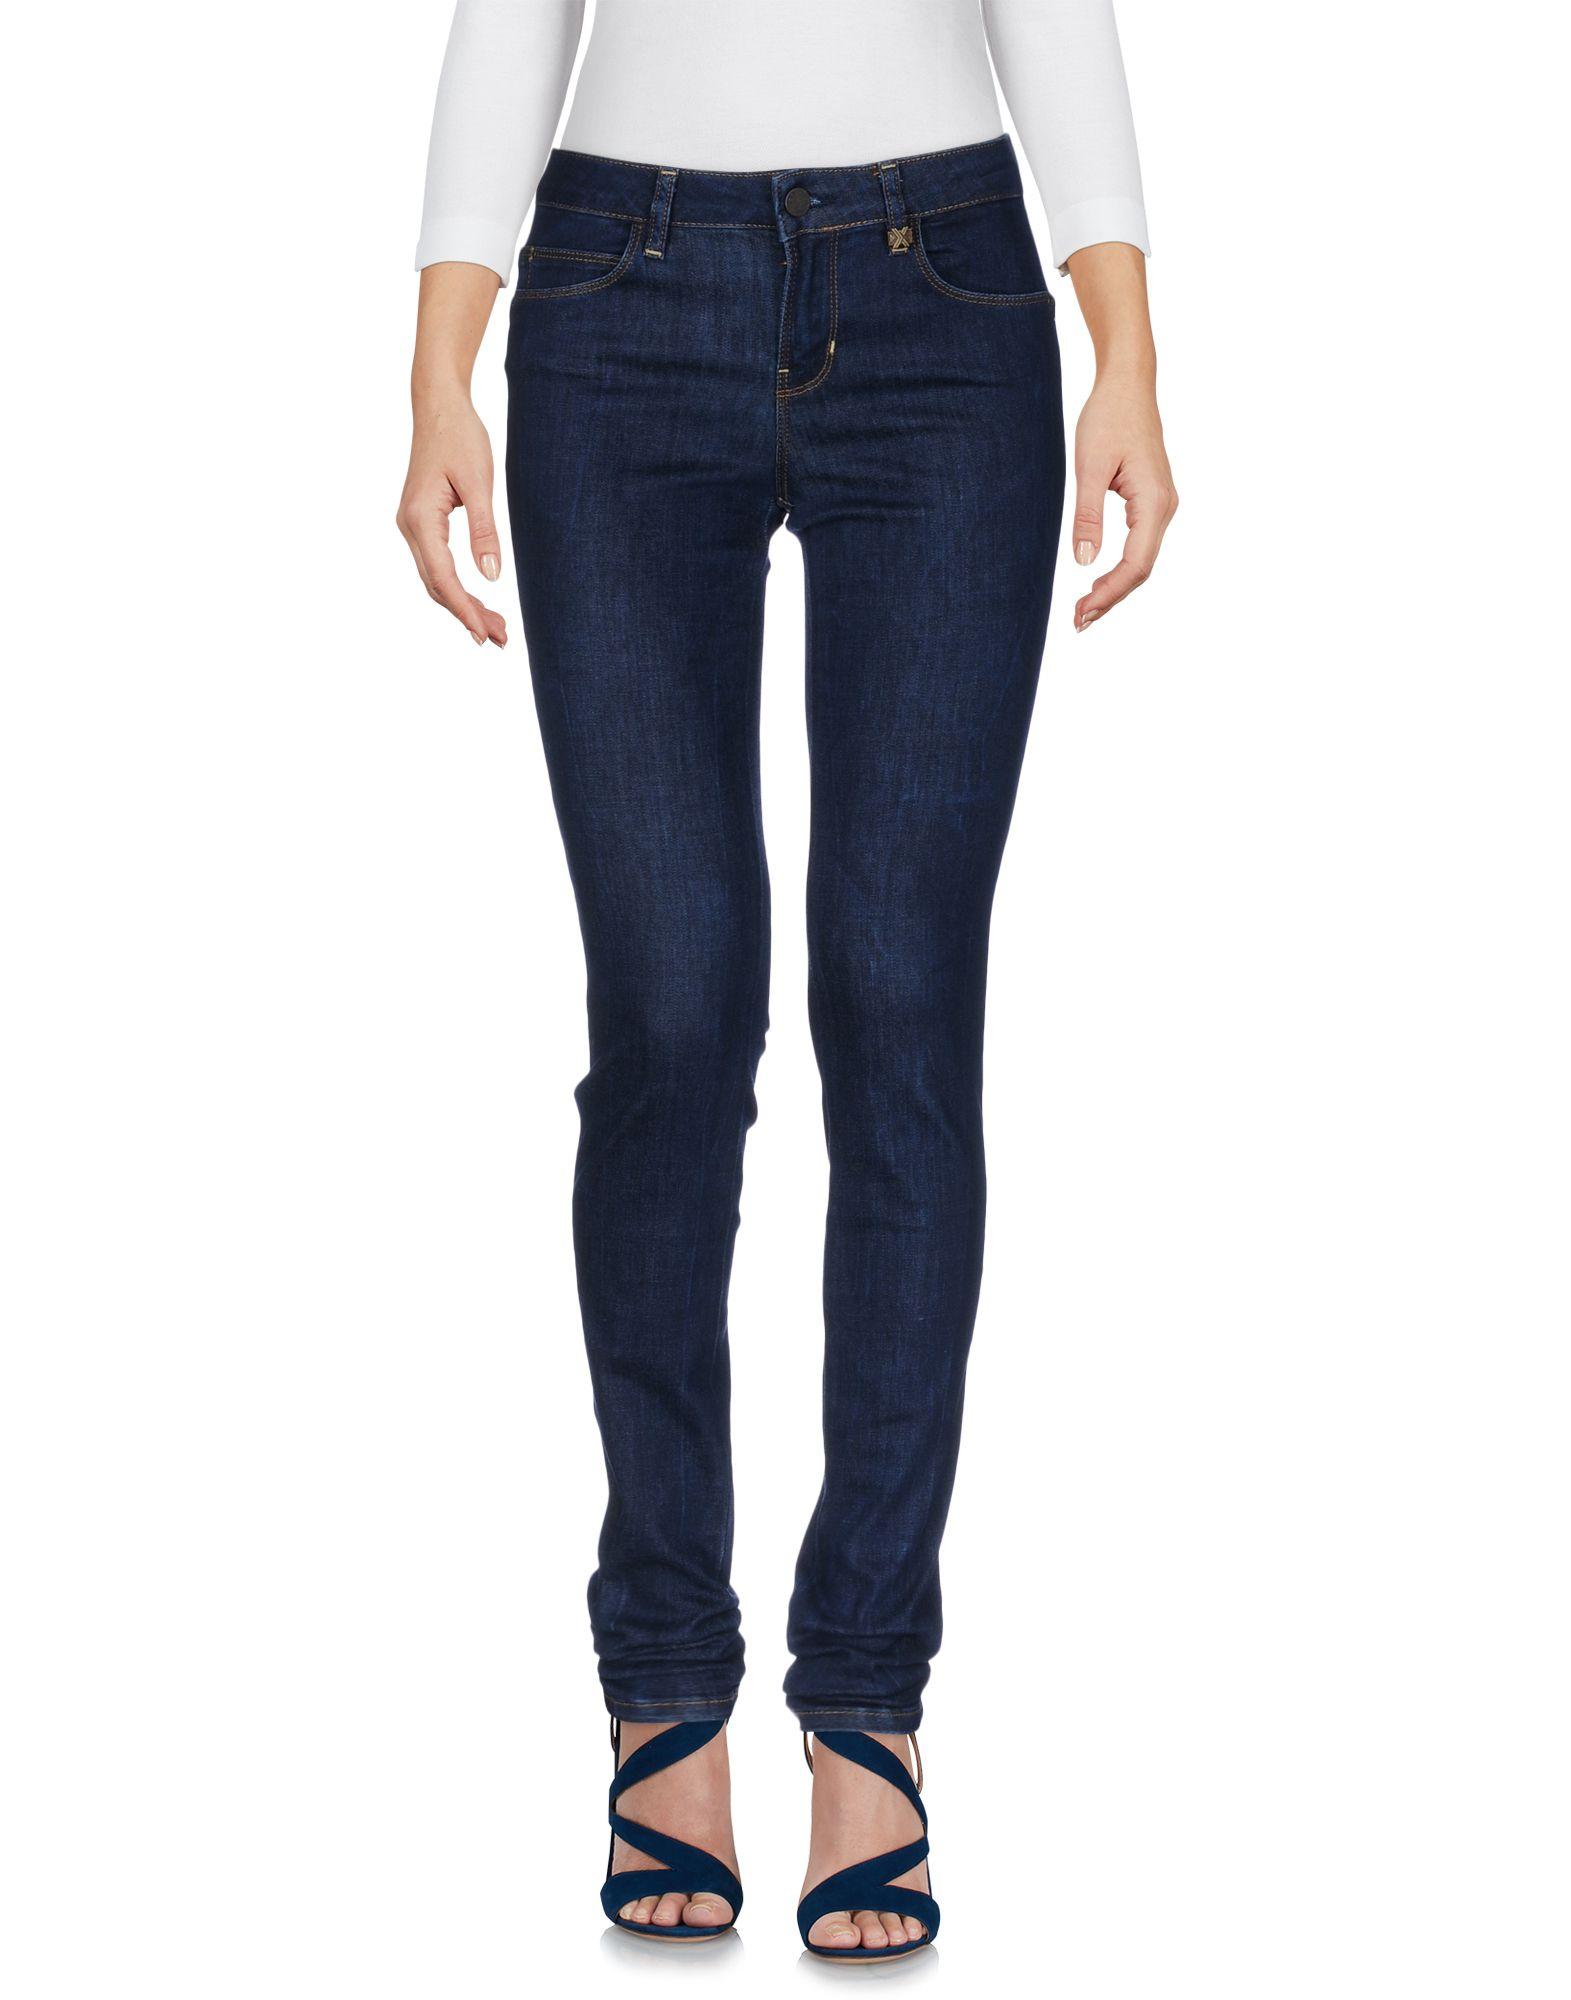 GUESS Damen Jeanshose1 blau